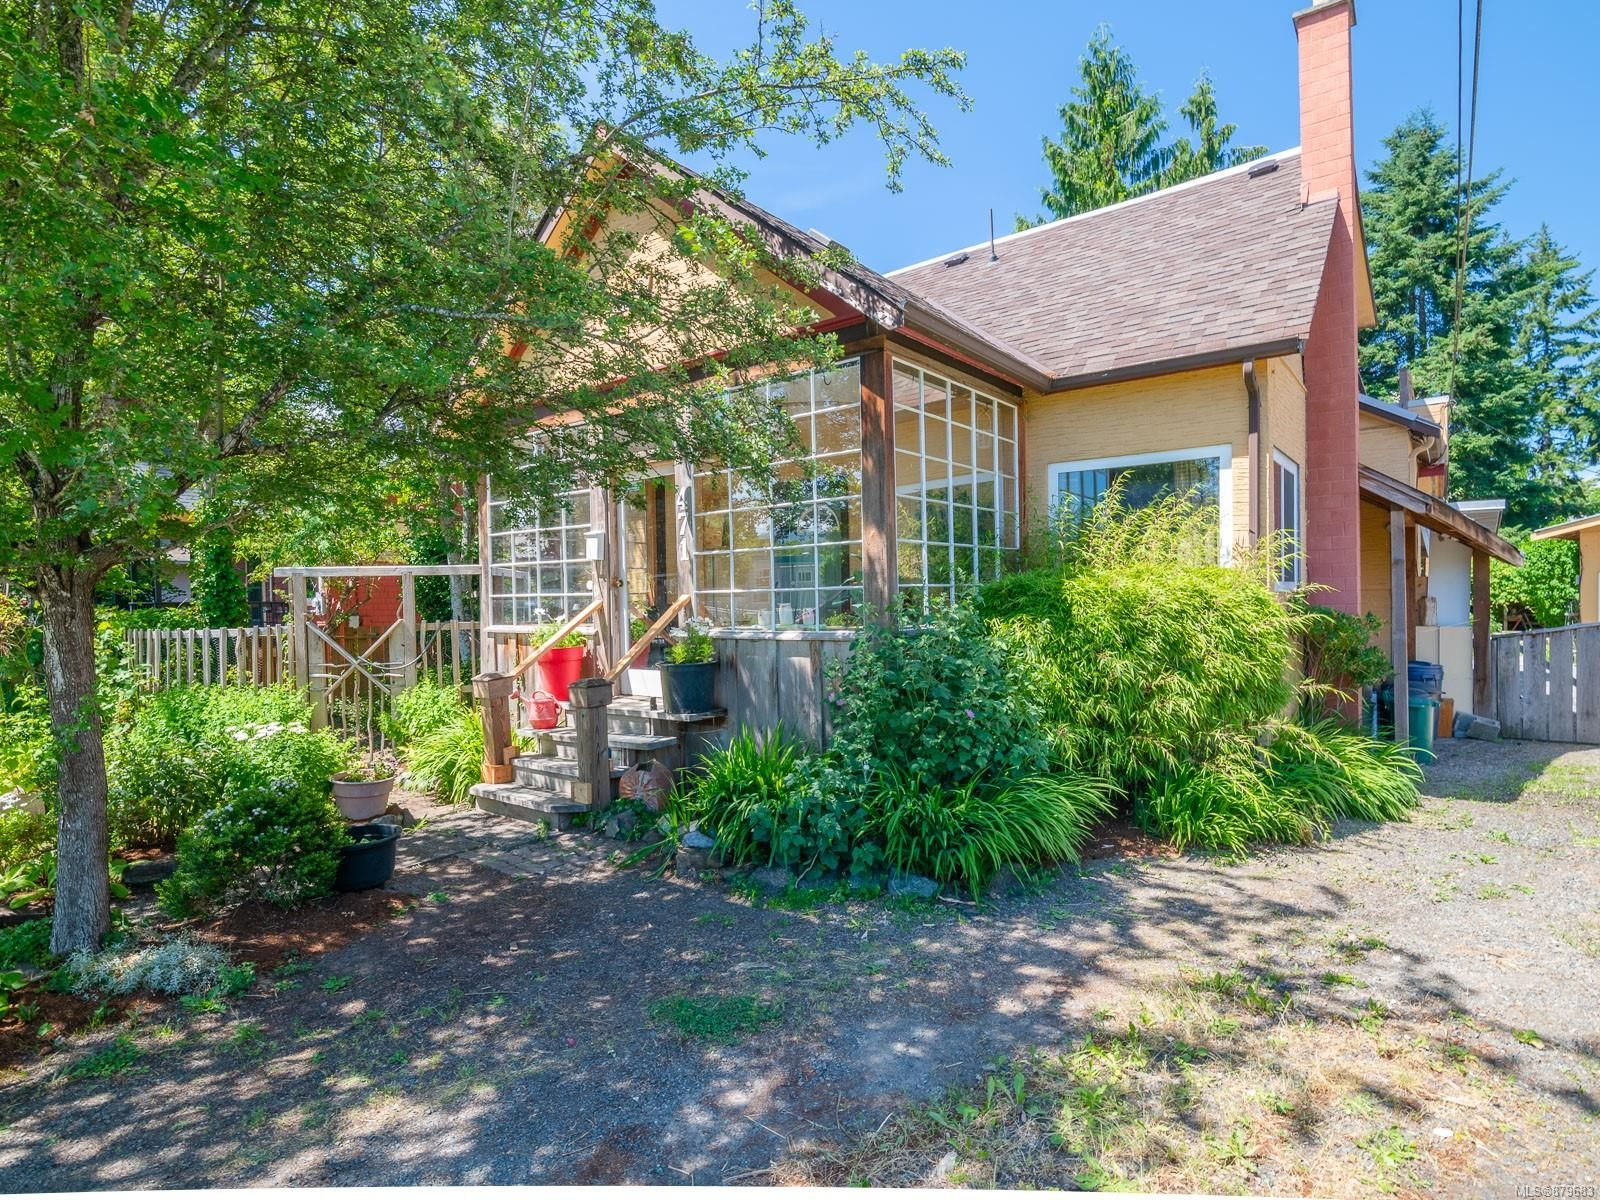 Main Photo: 471 Cairnsmore St in : Du West Duncan House for sale (Duncan)  : MLS®# 879683